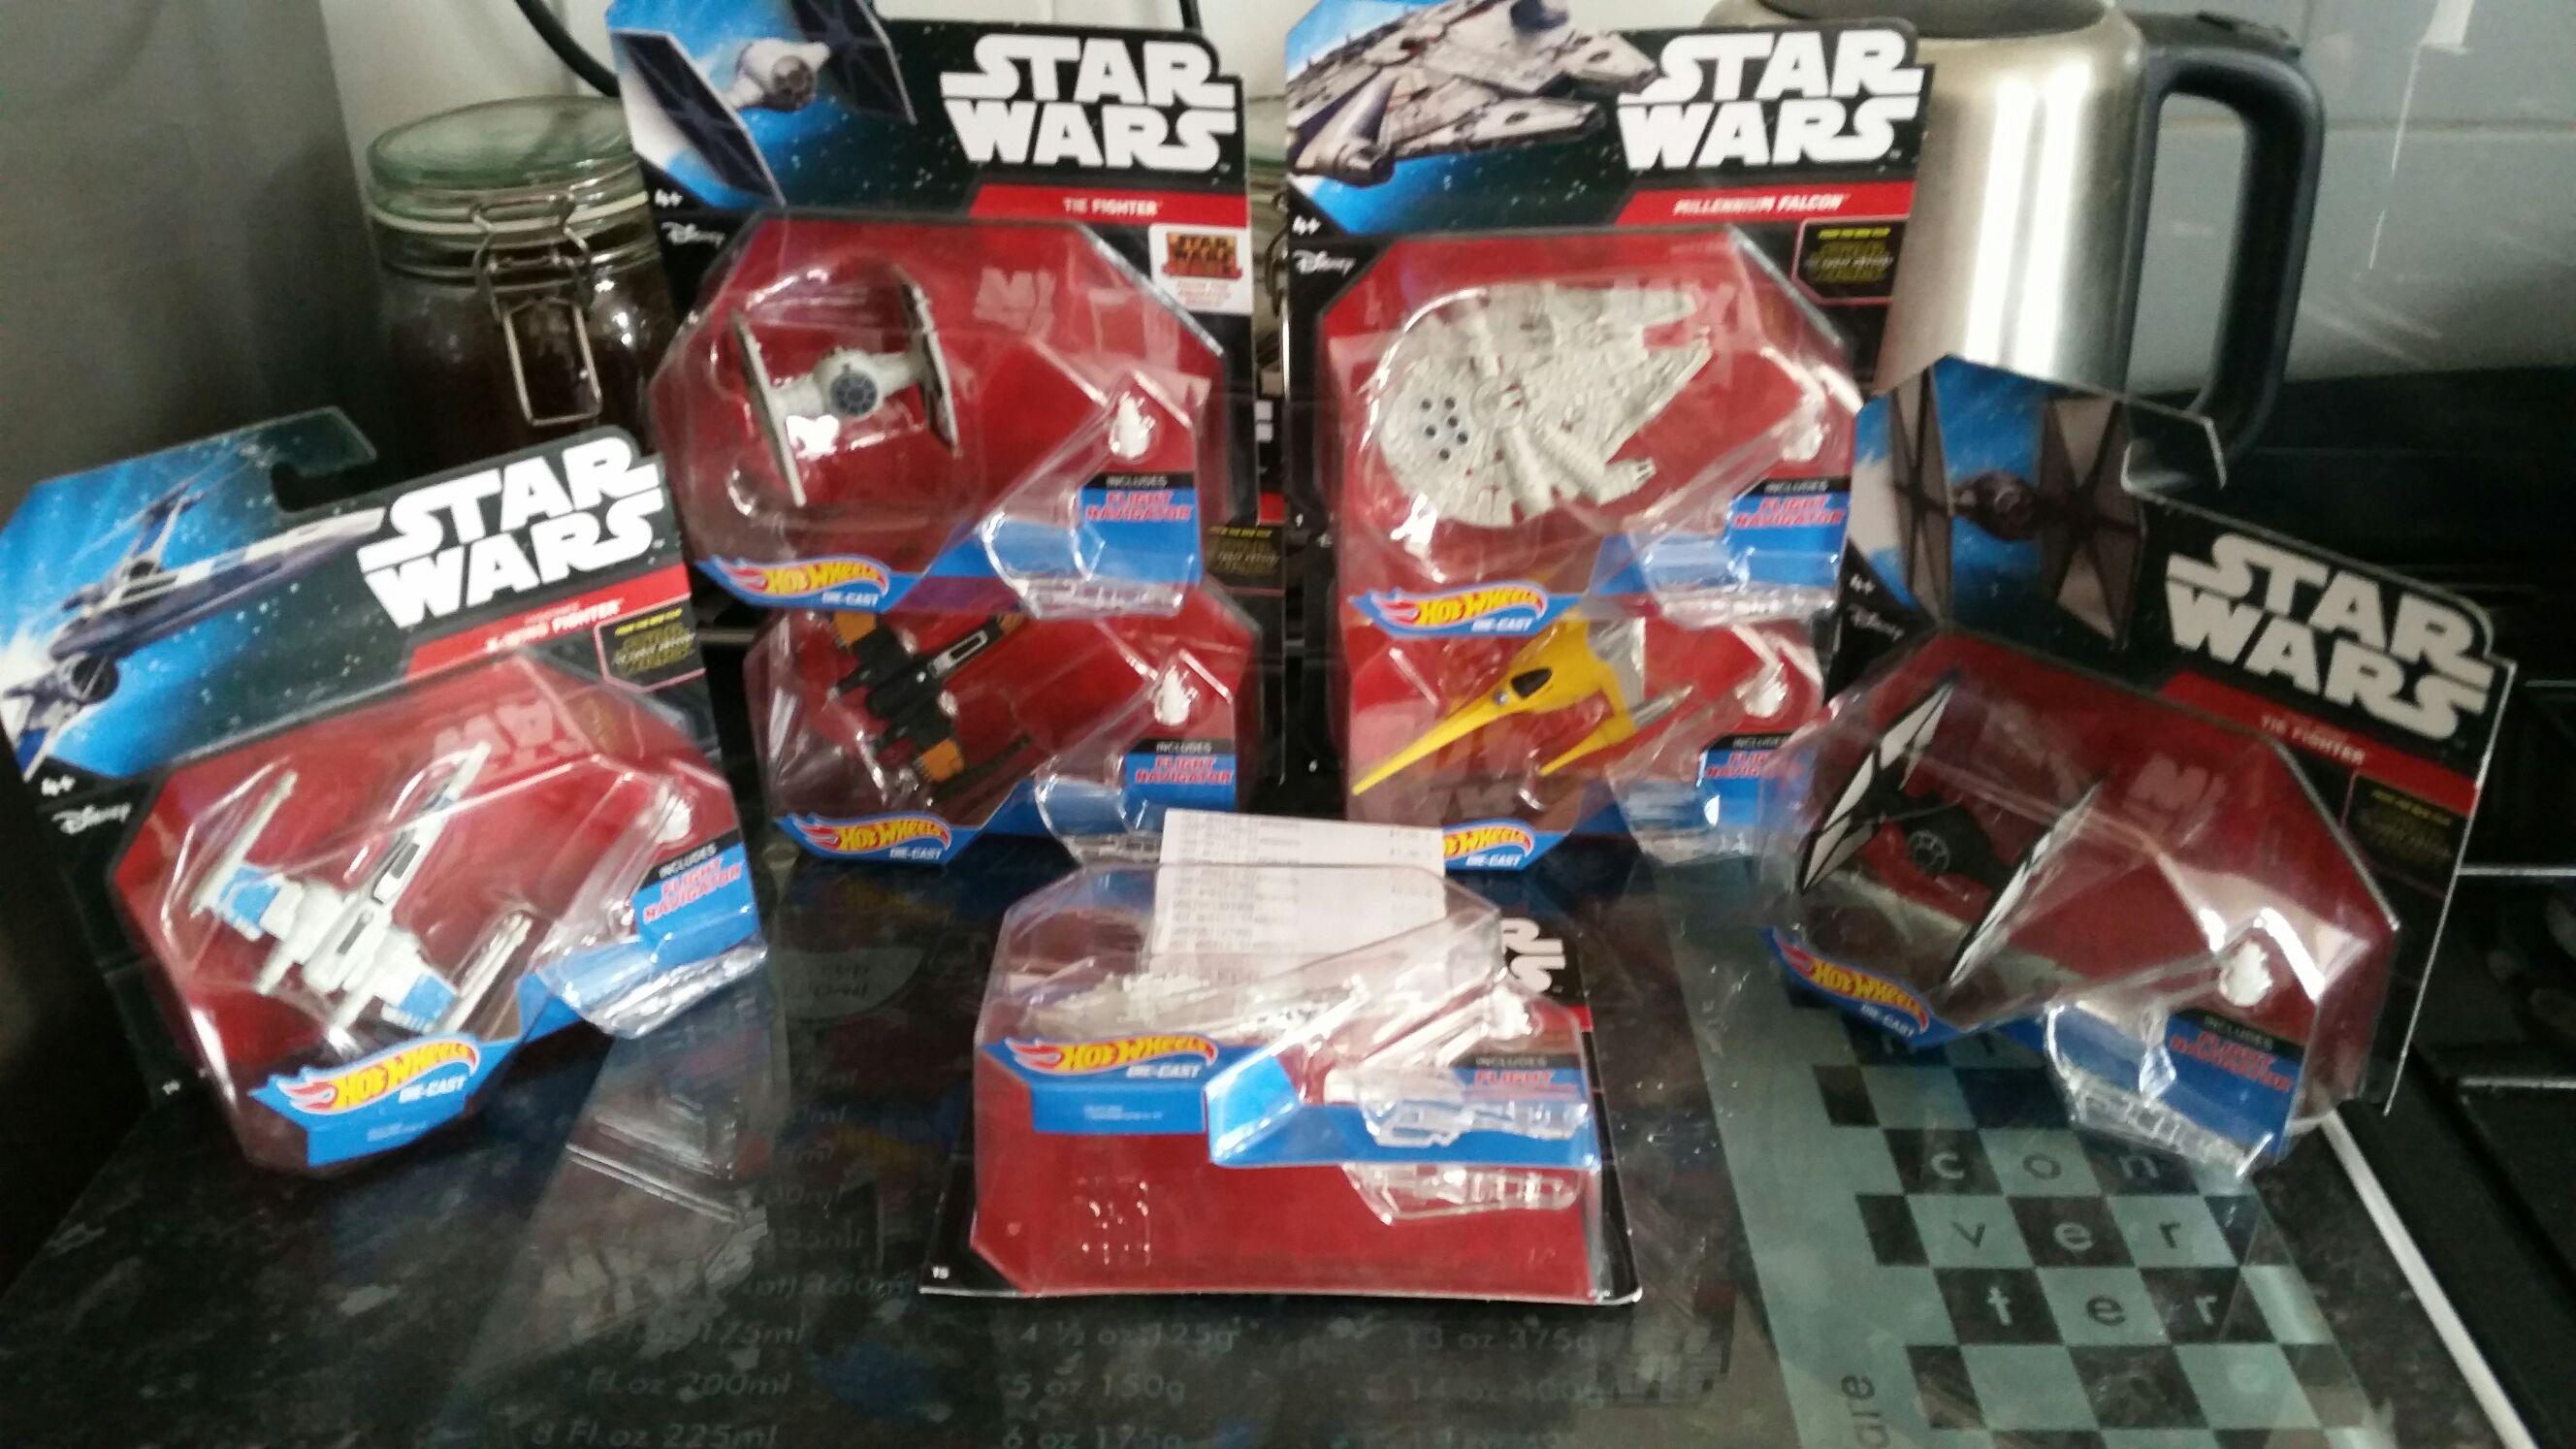 Star Wars - Hot wheels £1 (PoundWorld)